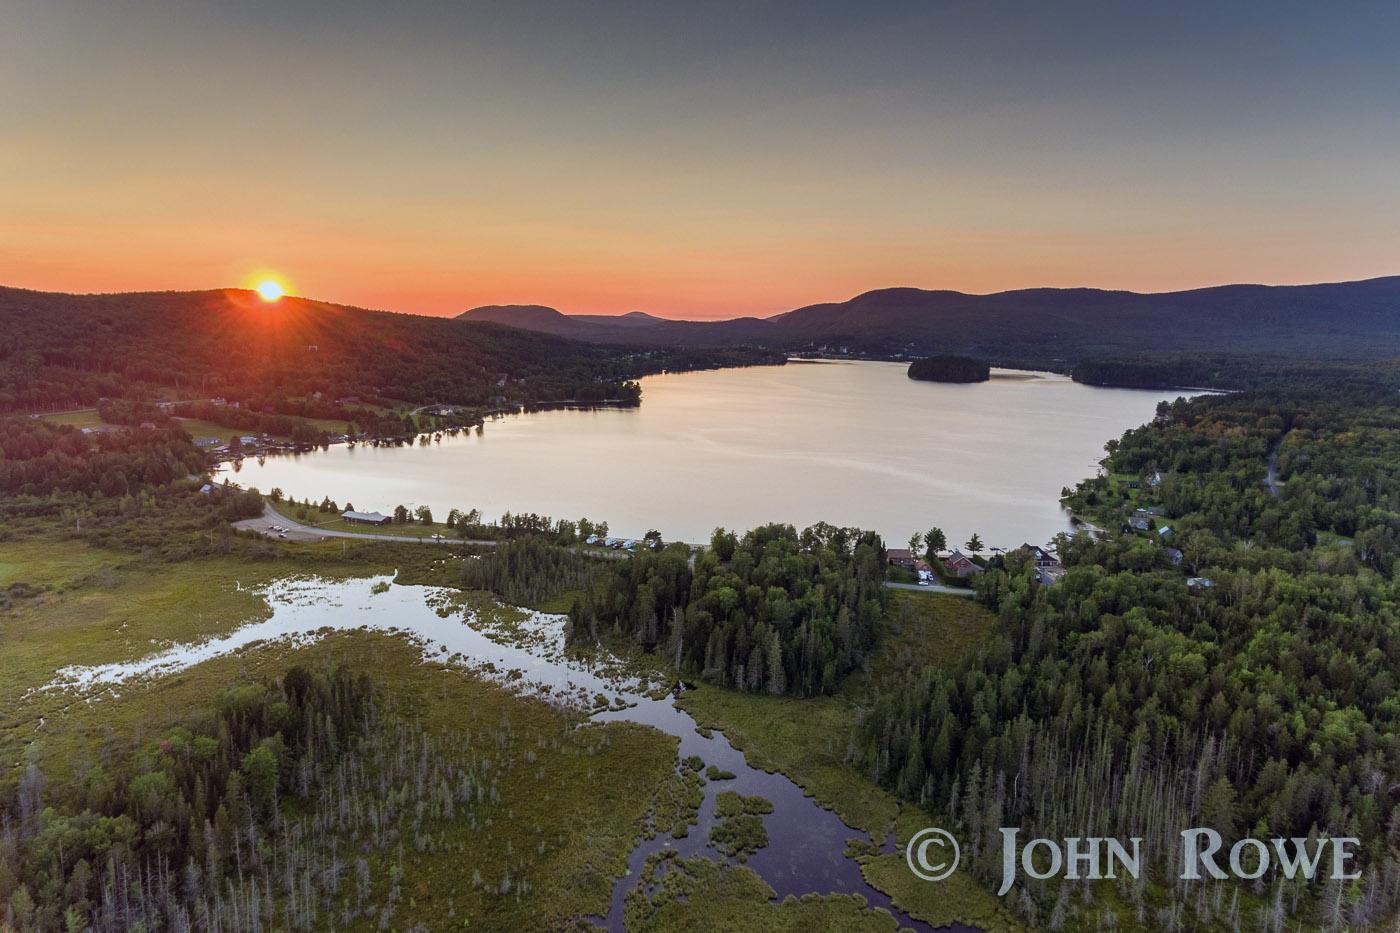 island pond, vt sunset